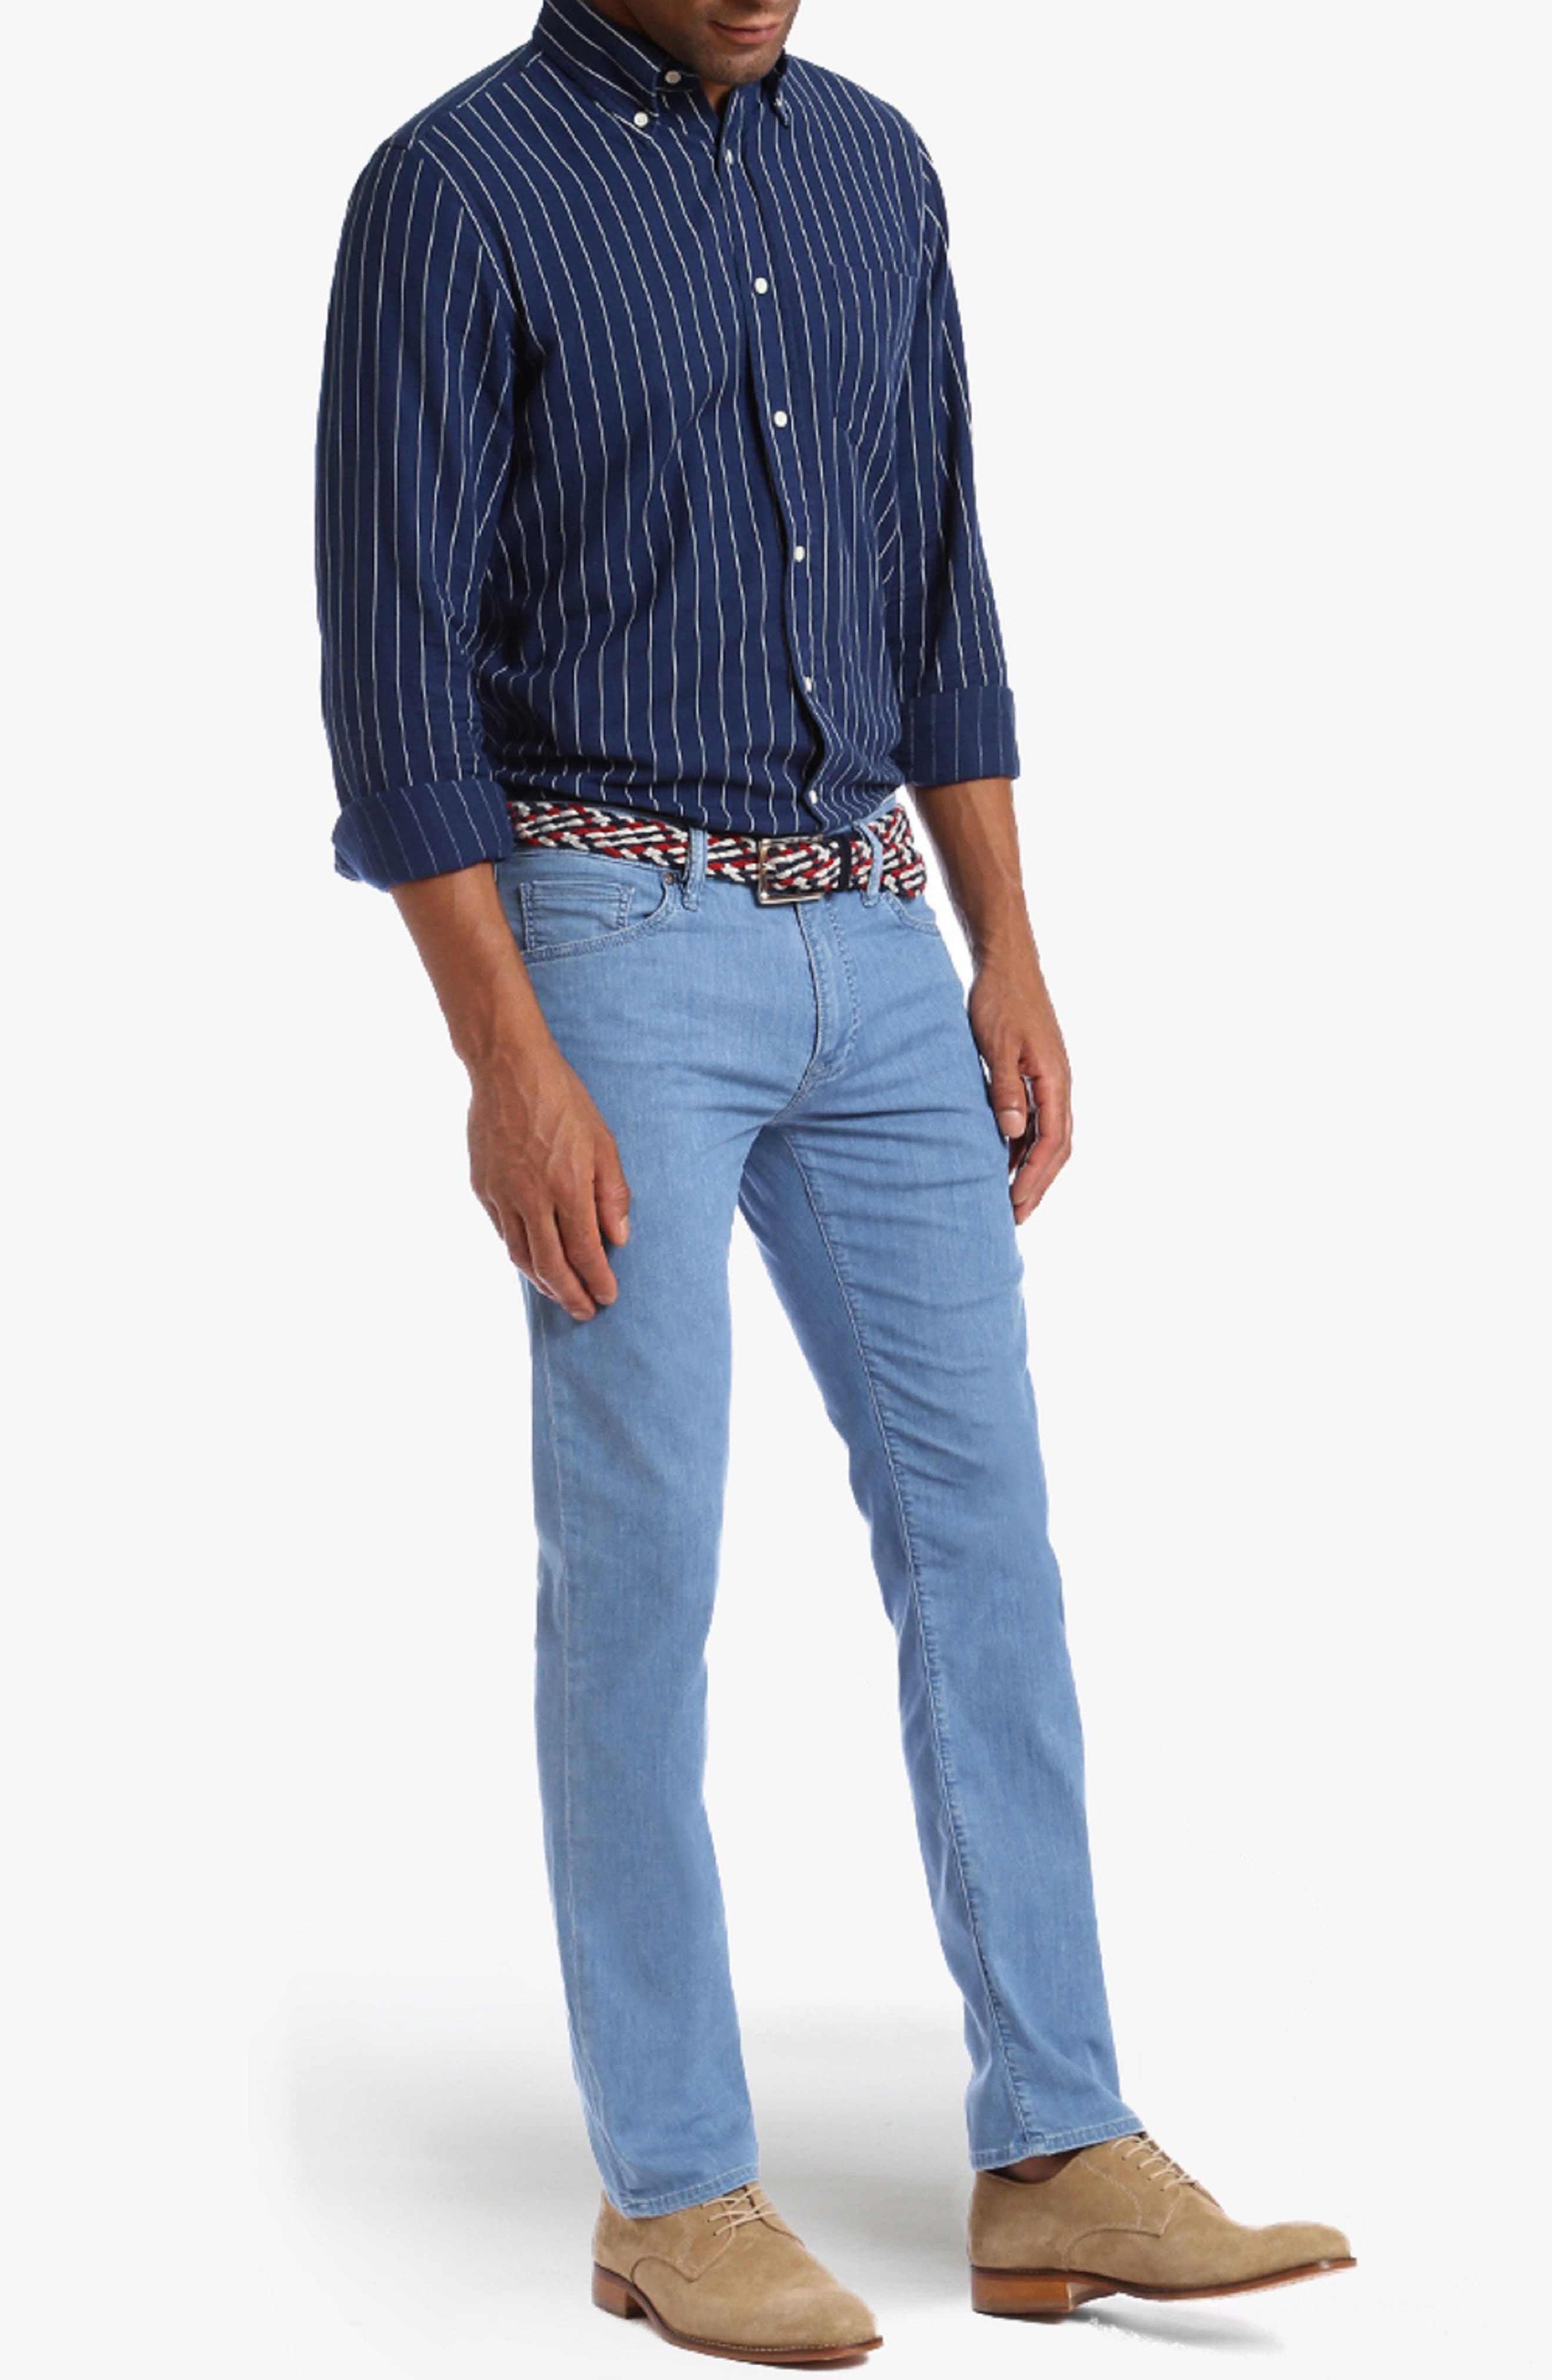 Charisma Relaxed Fit Jeans,                             Alternate thumbnail 4, color,                             Light Maui Denim